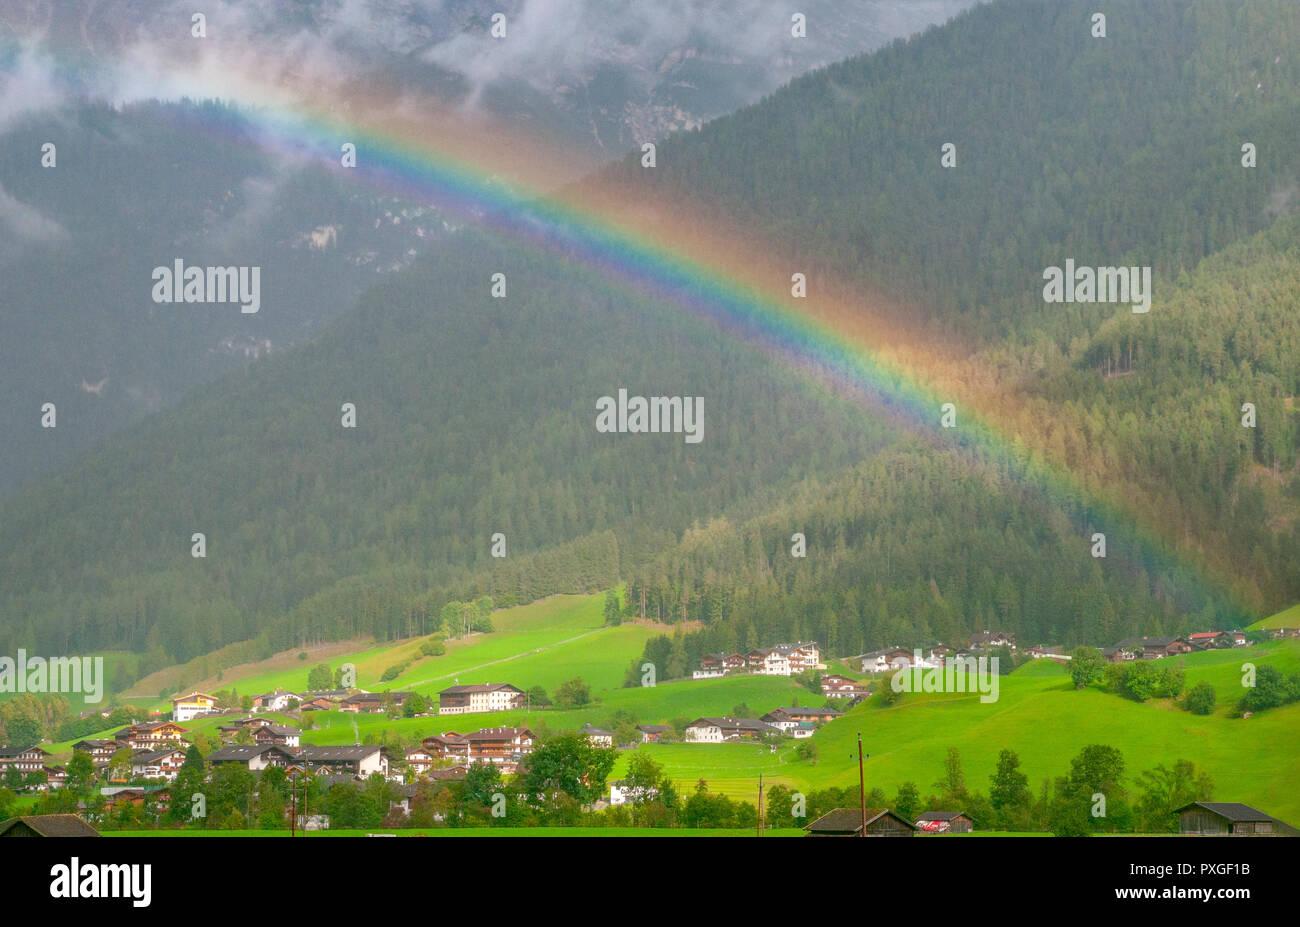 Rainbow Photographed in Neustift im Stubaital, Tyrol, Austria Stock Photo